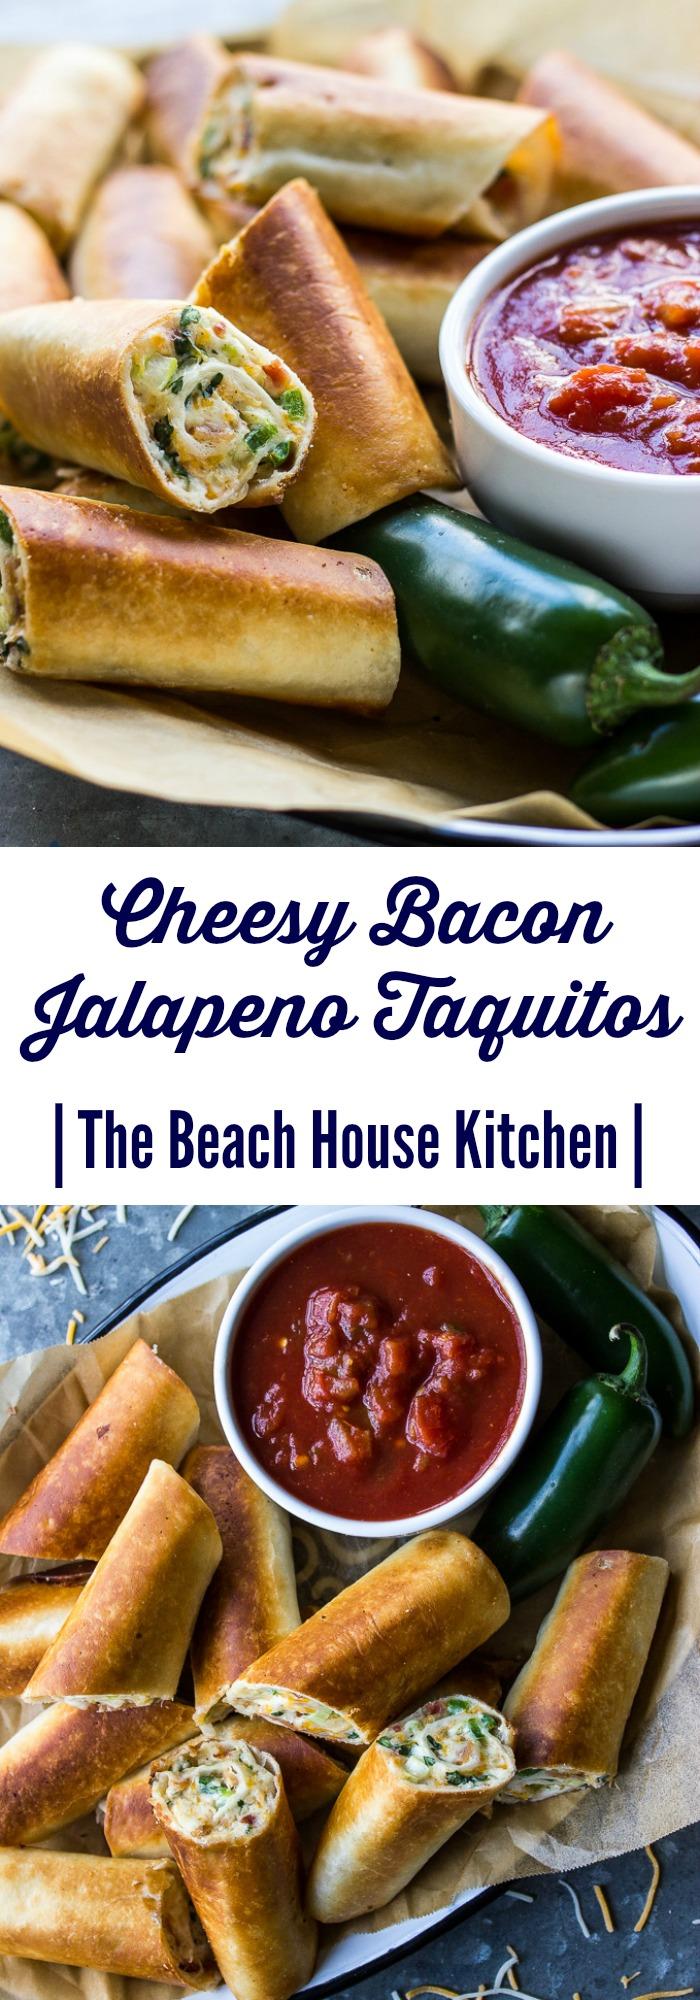 Cheesy Bacon Jalapeño Taquitos | The Beach House Kitchen